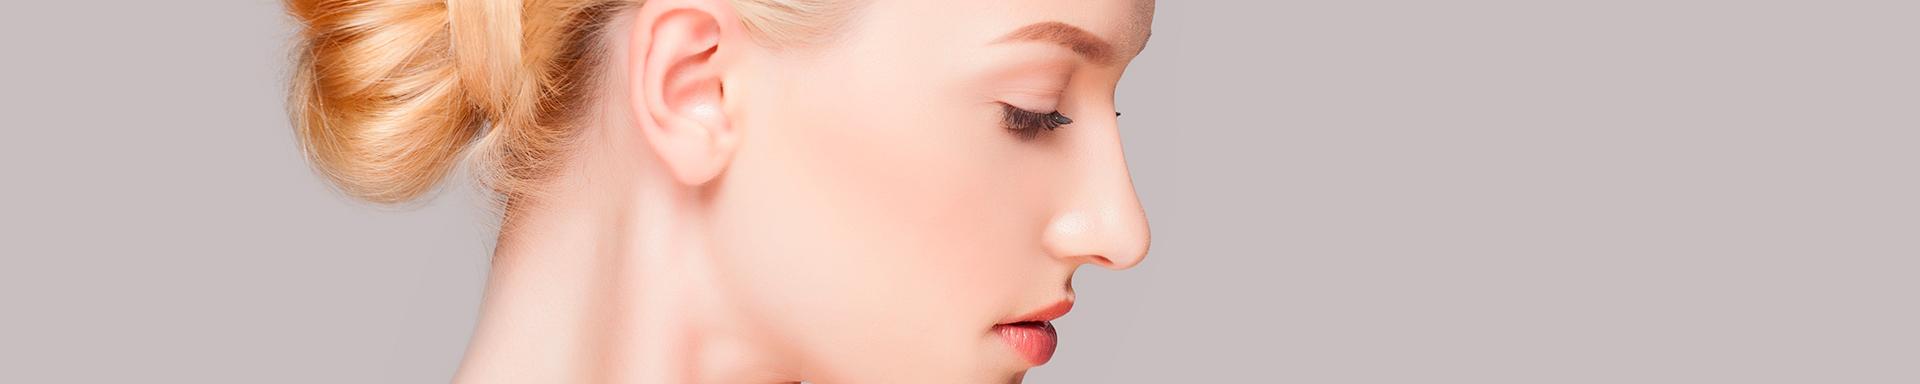 Tratamiento-Cancer-Piel-sin-Cirugia-barcelona-dermatologo-dermatoleg-tractament-sense-cirurgia-teknon